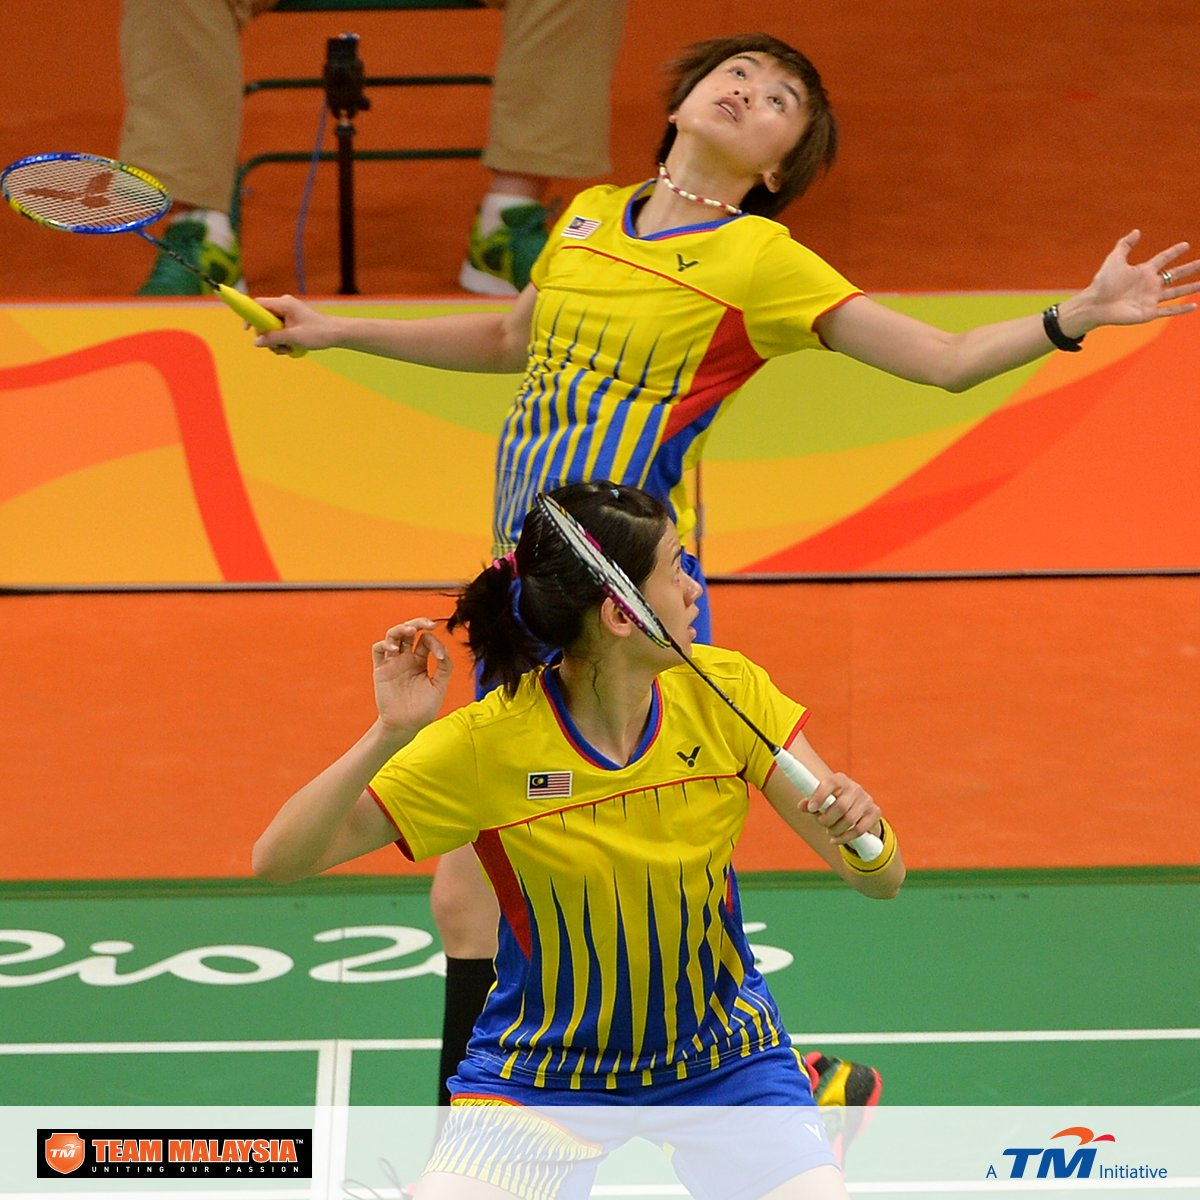 "Team Malaysia on Twitter ""Beregu wanita 🇲🇾 Vivian Hoo Woon Khe"